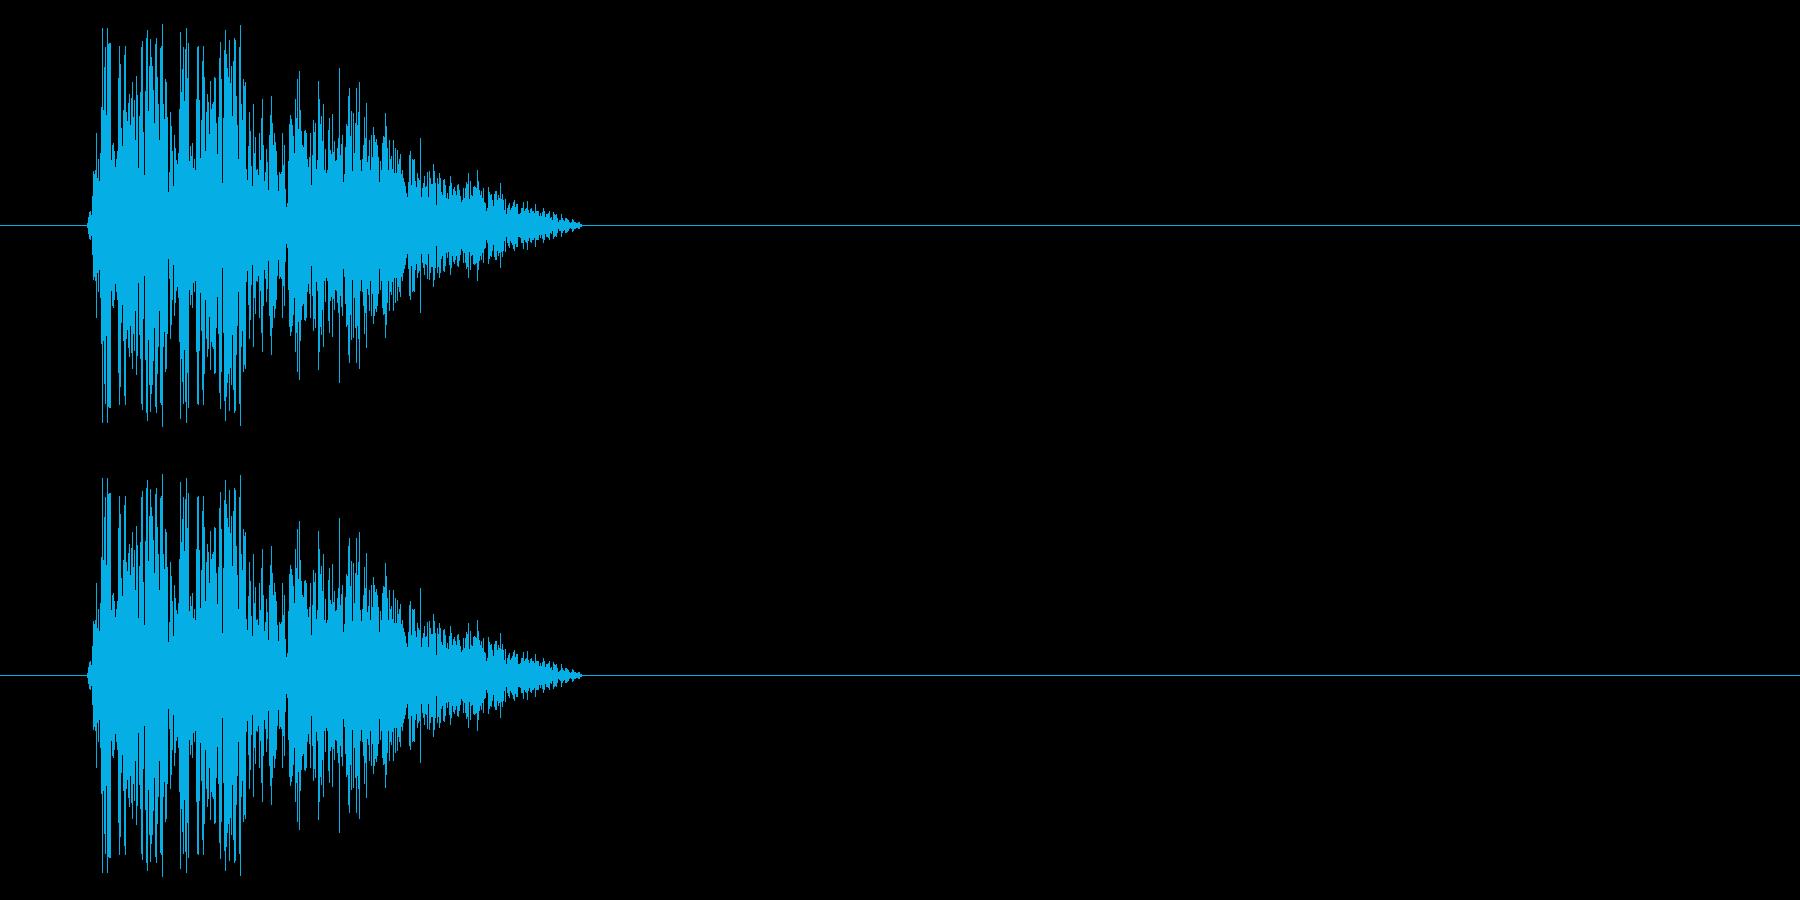 SNES 格闘06-12(倒れる)の再生済みの波形